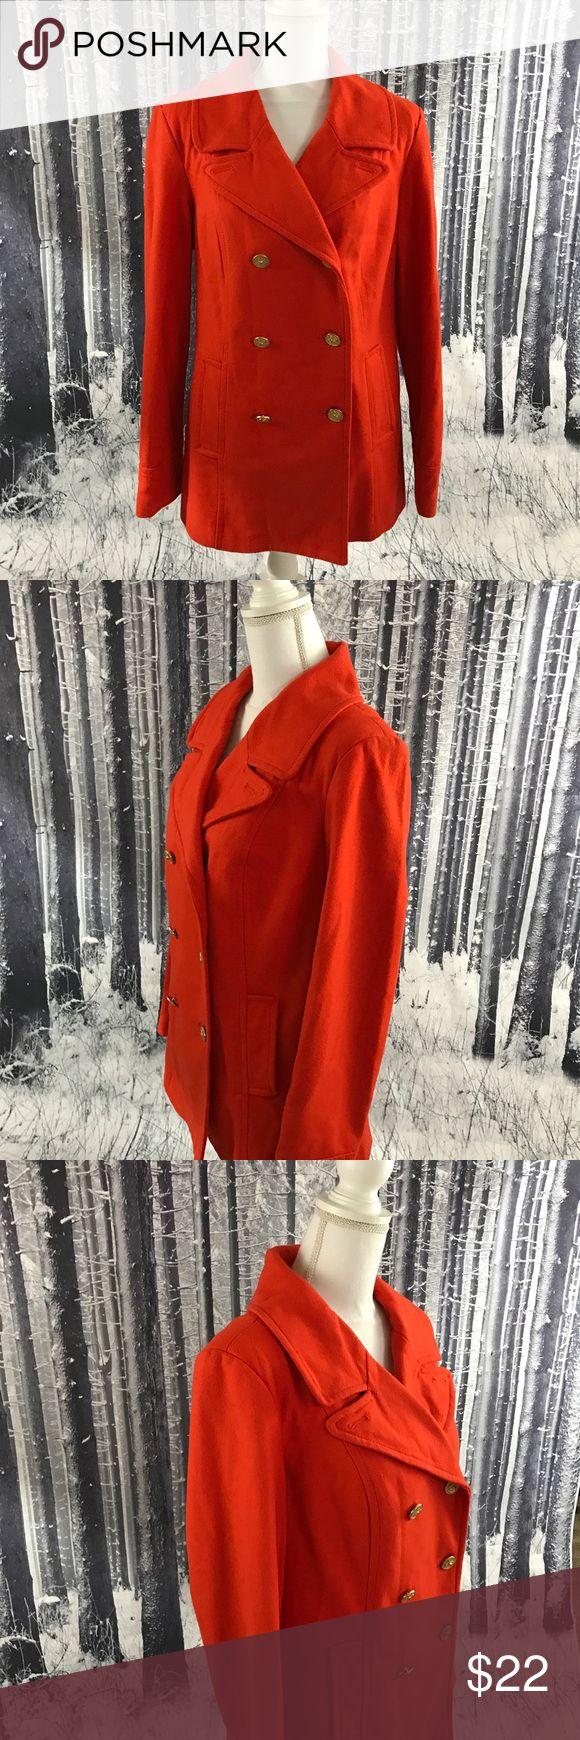 Orange Old Navy size large pea coat. Orange Old Navy pea coat in good used condition. Size large. Top of shoulder to bottom of hem approximately 28.  Underarm to underarm approximately 21.  Sleeve length approximately 25 1/2.    (539) Old Navy Jackets & Coats Pea Coats